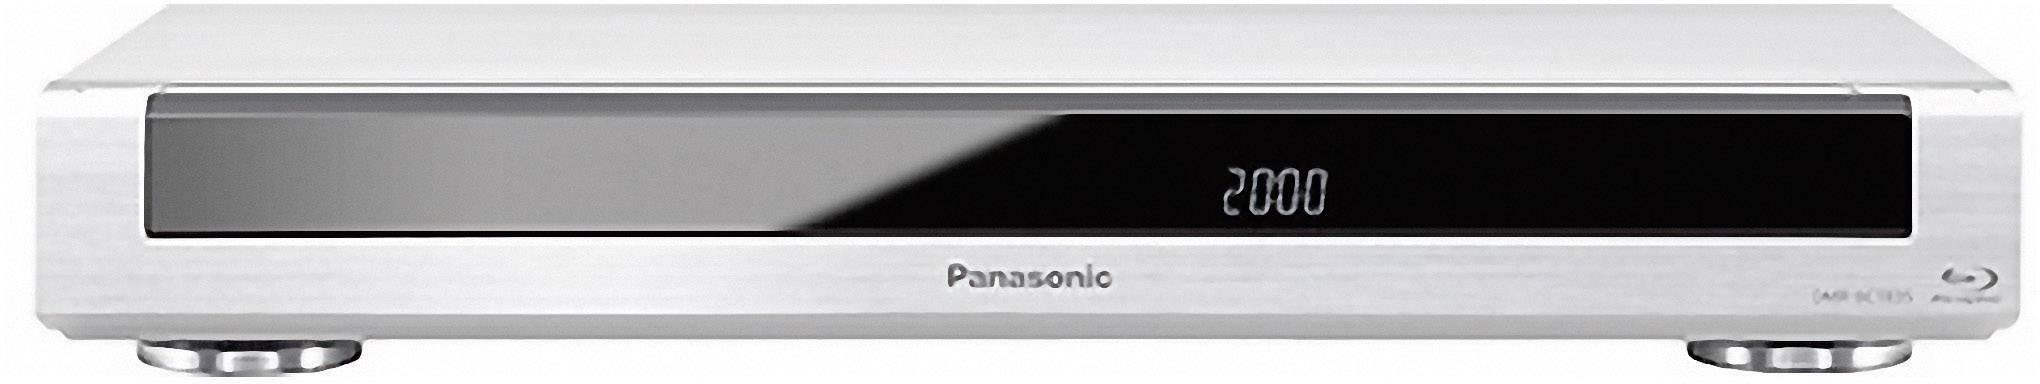 Panasonic DMR-BCT835EG Recorder Drivers Download